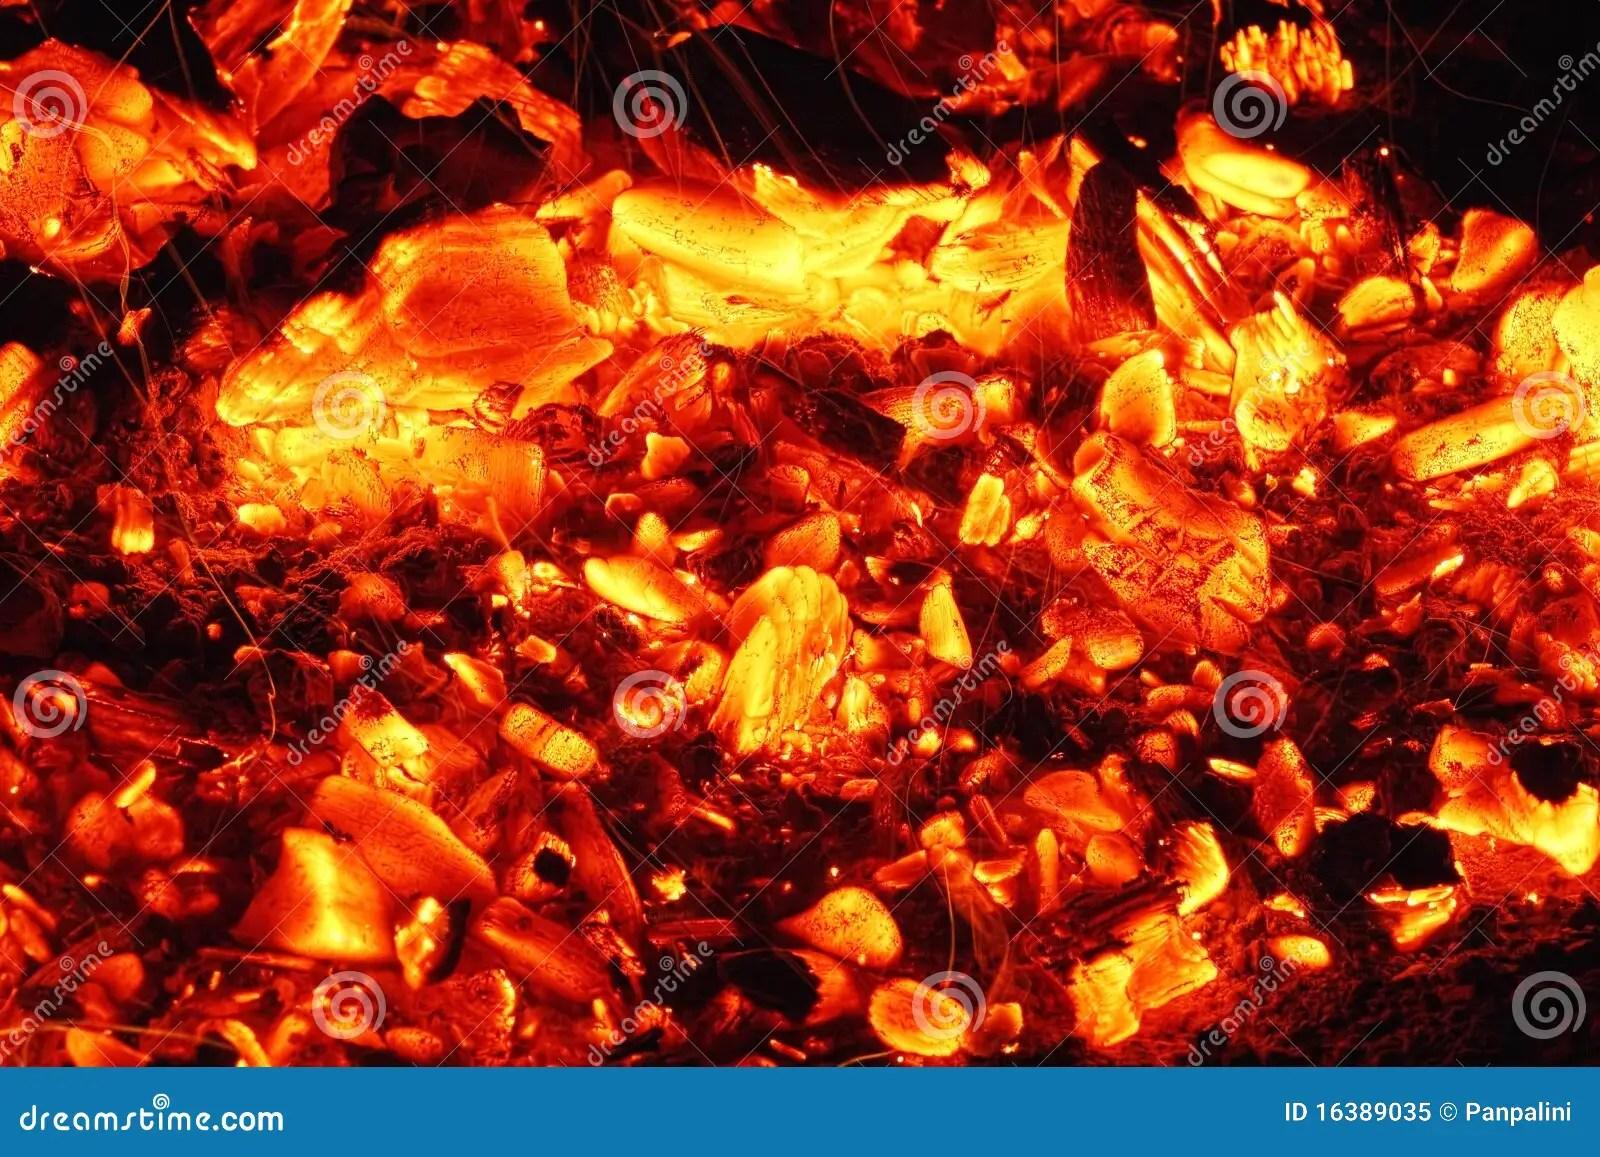 Glowing embers stock image Image of live coals horizontal  16389035